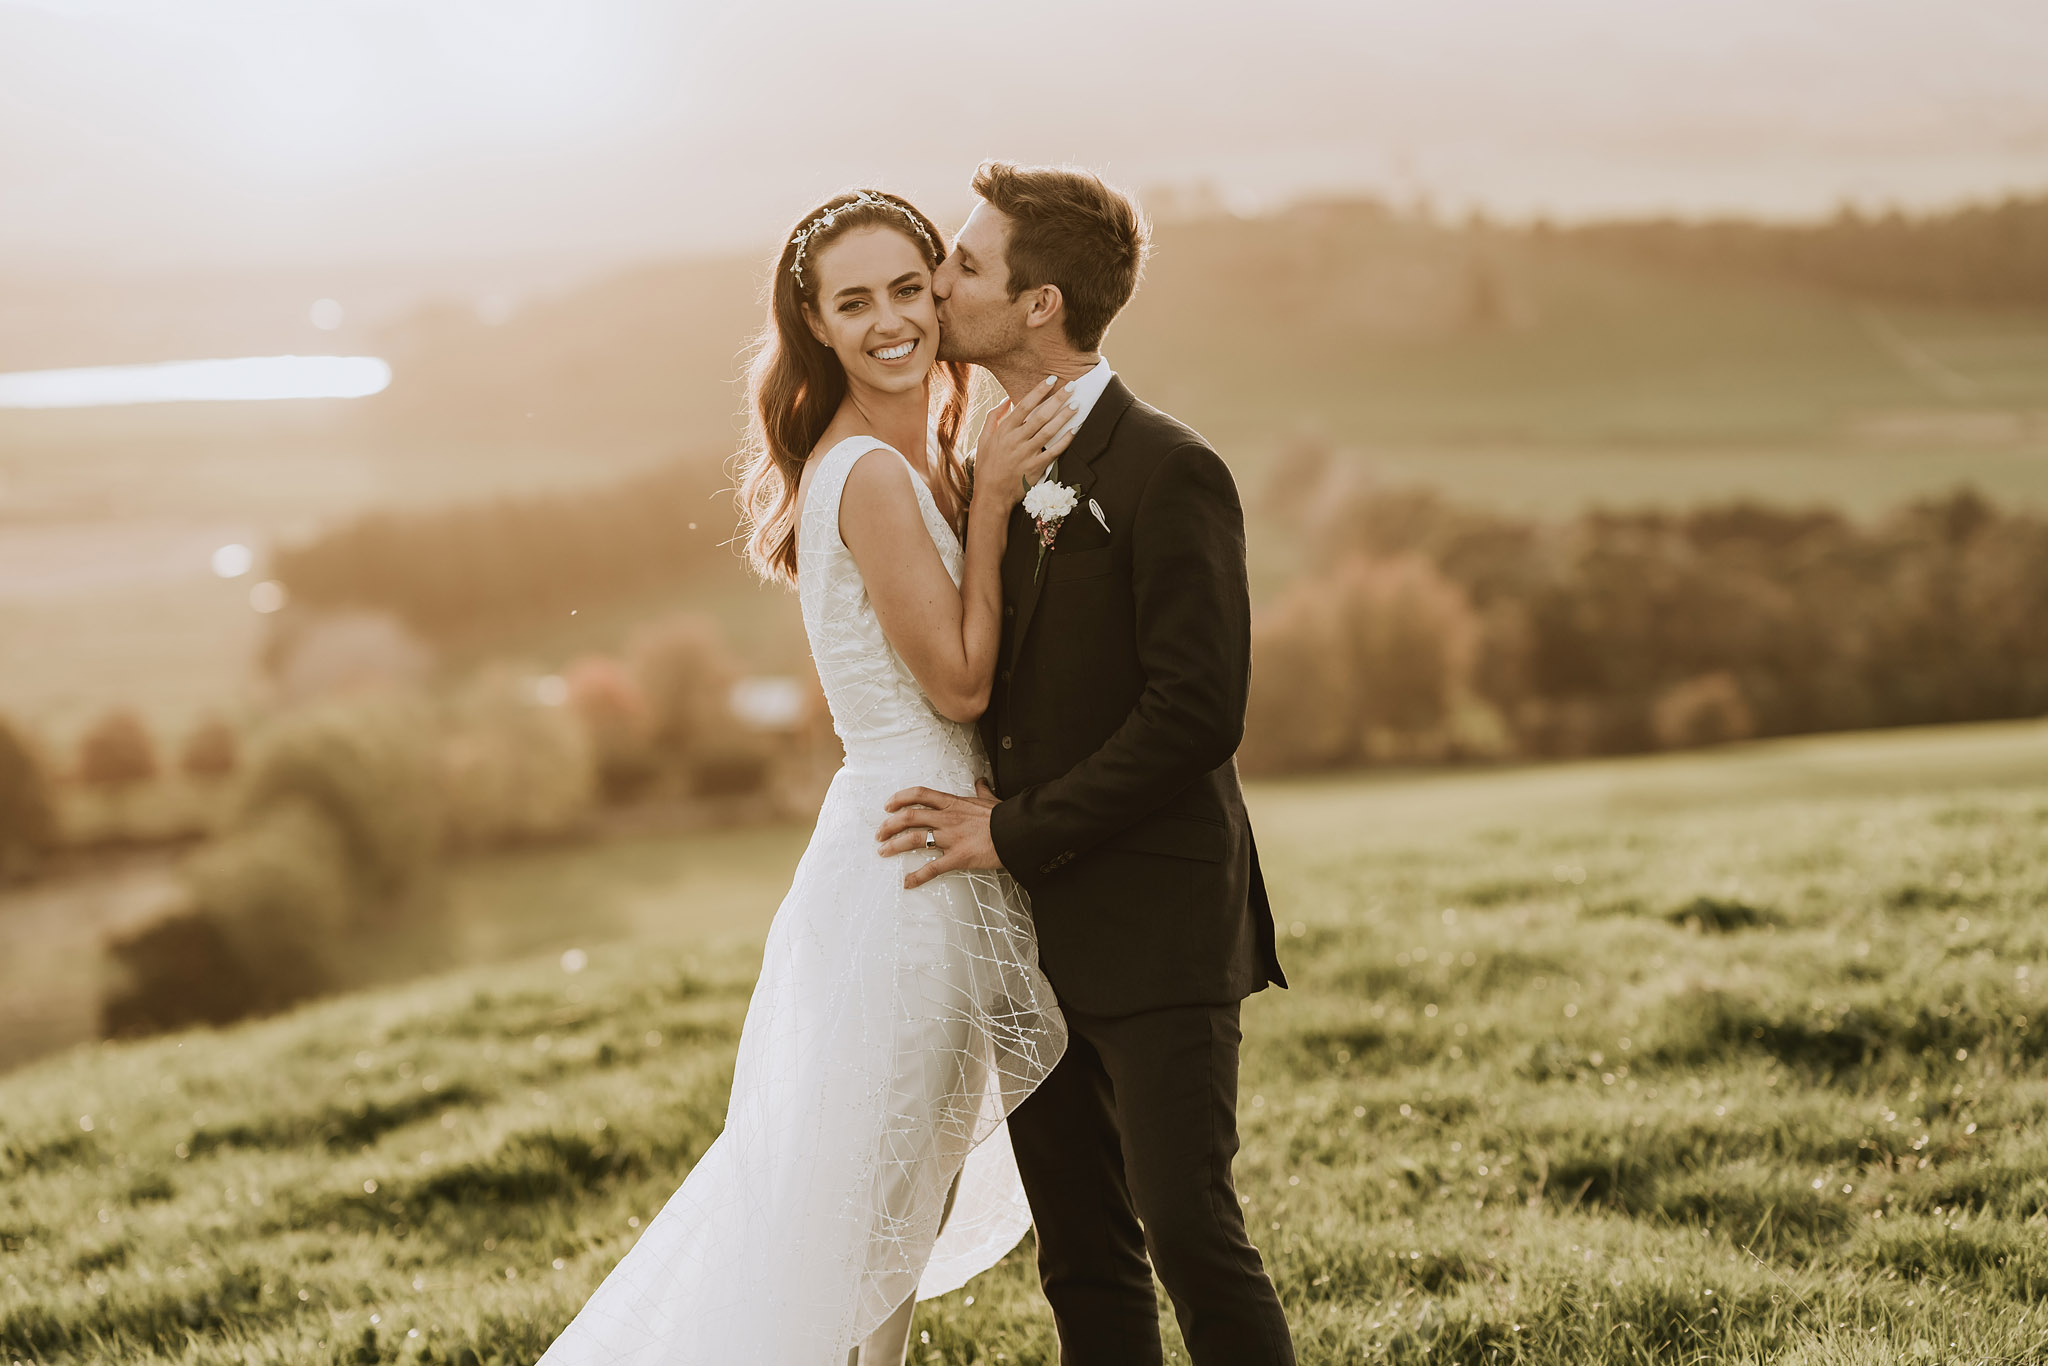 rambo-estrada-rubymatt-kauri-bay-boomrock-auckland-wedding-photographers-0684-c copy.jpg